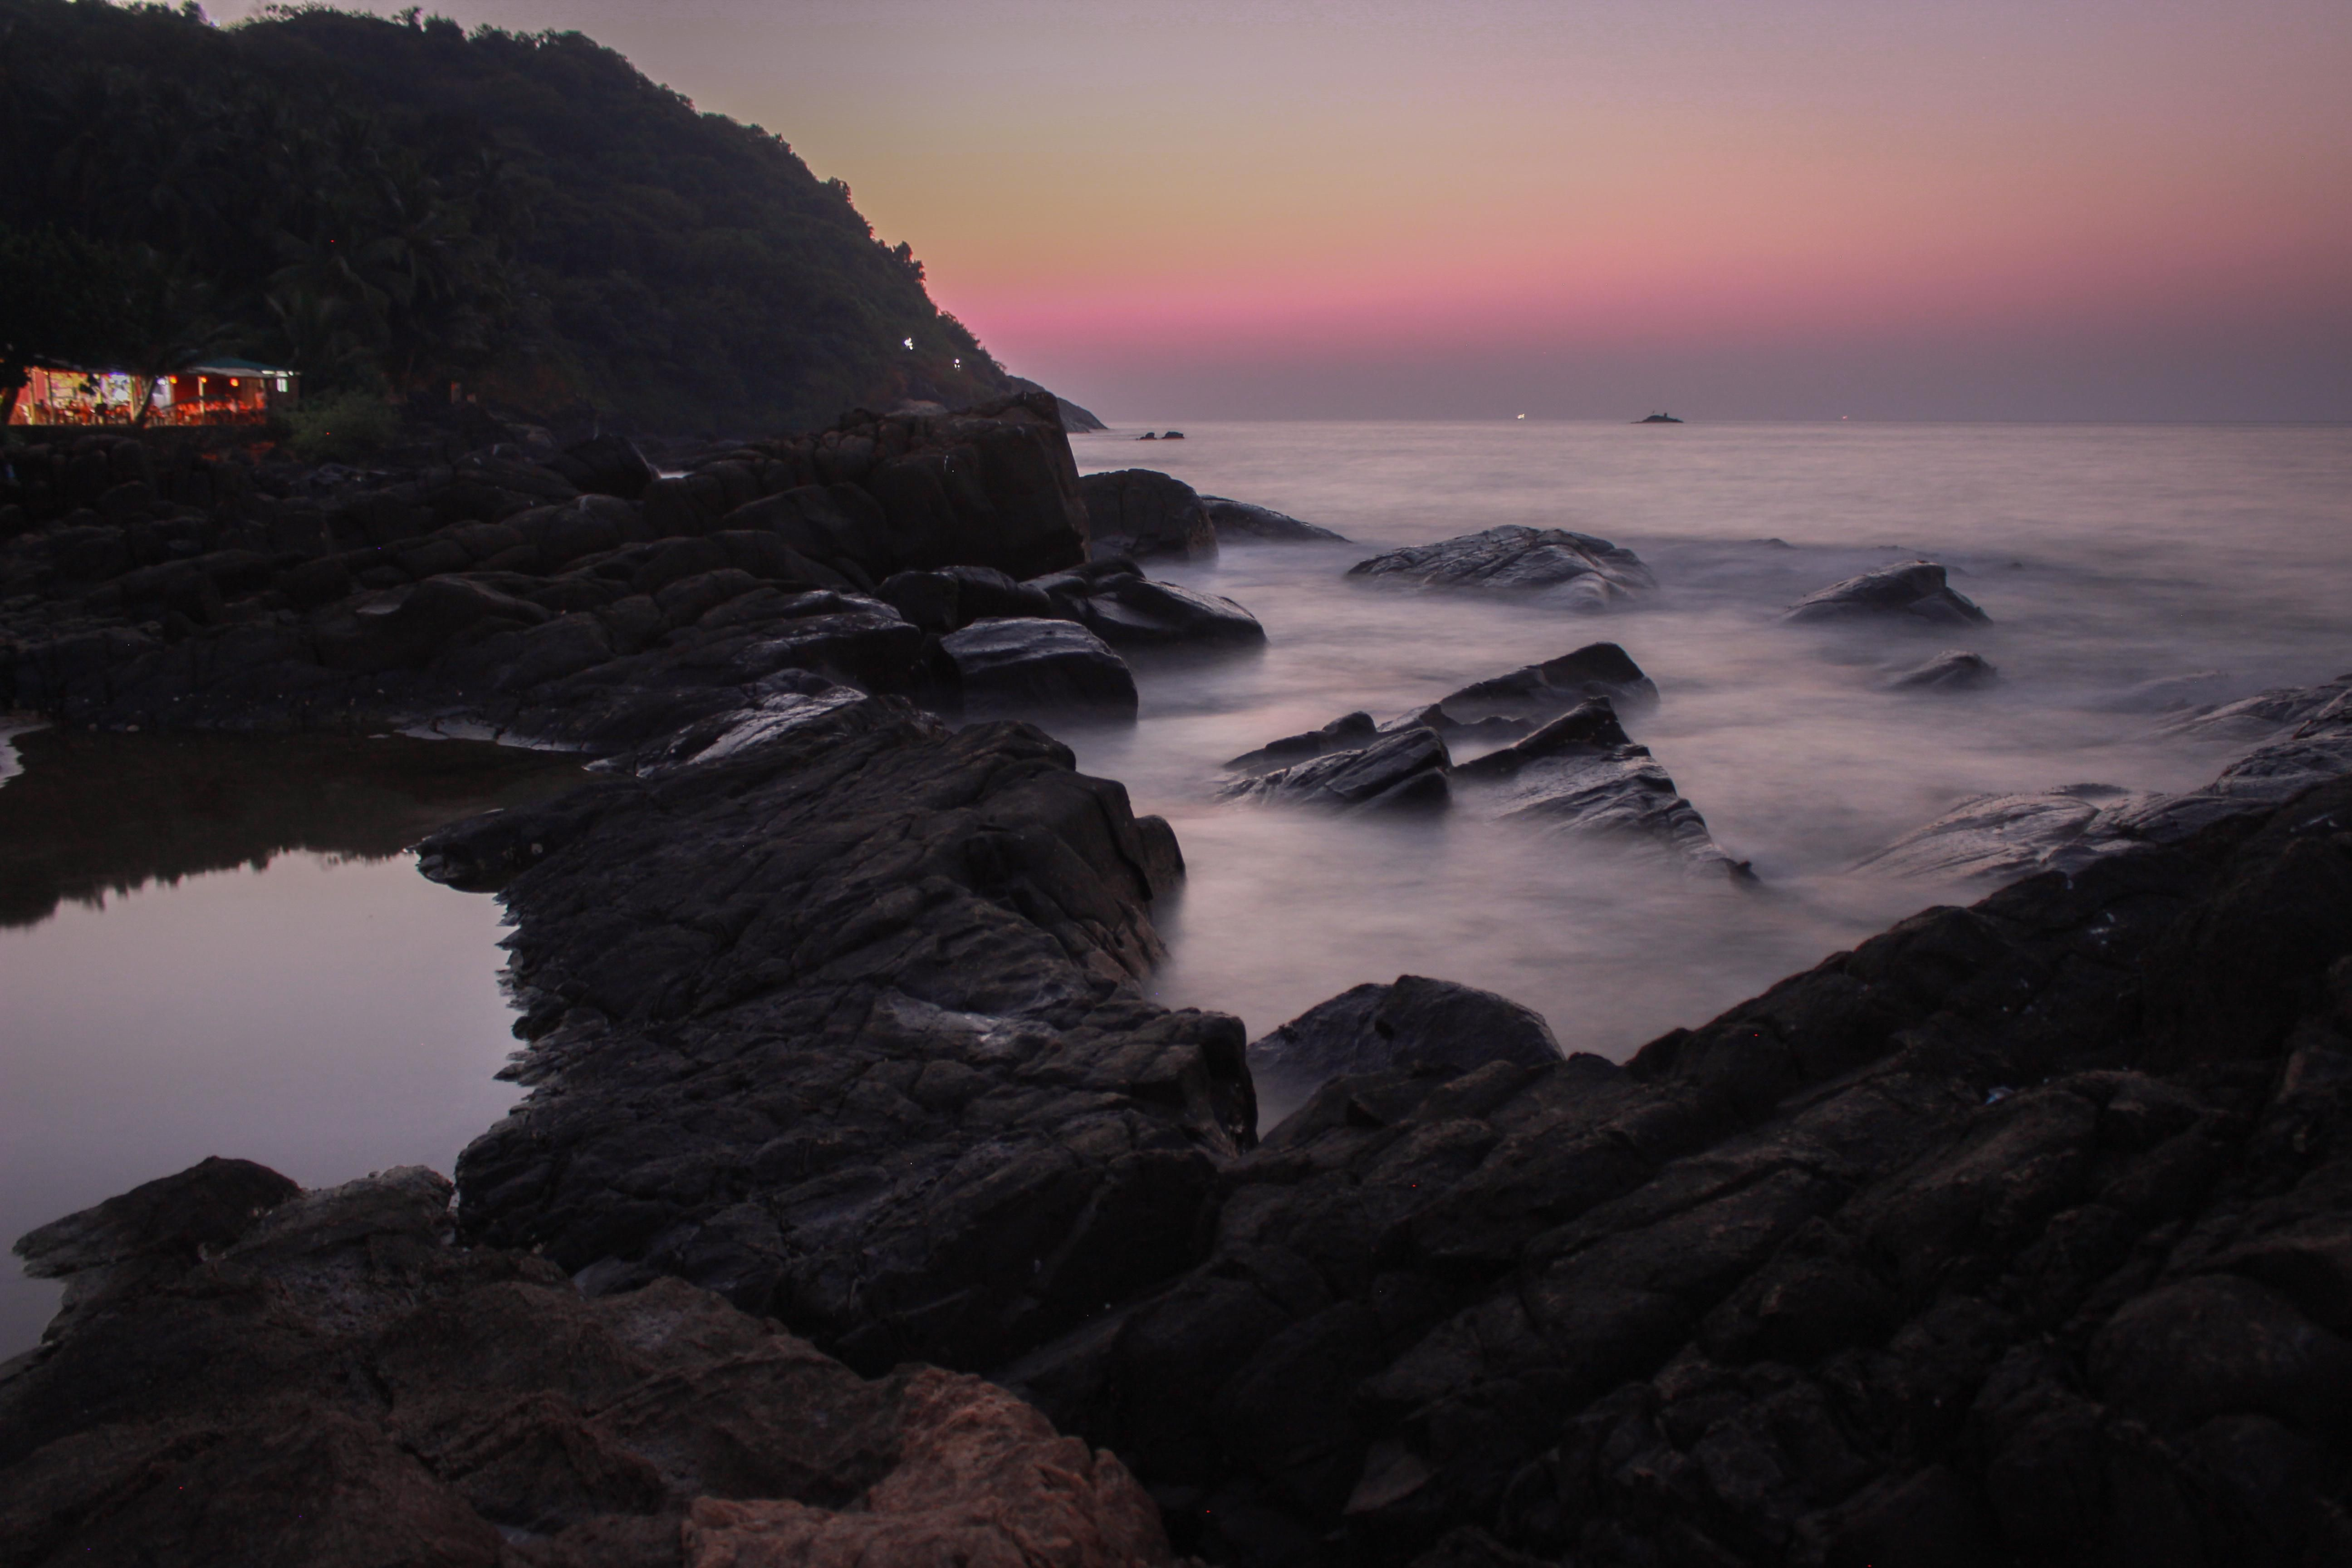 A beautiful serene sunset at Kudle Beach Gokarna India [5184x3456] [OC]